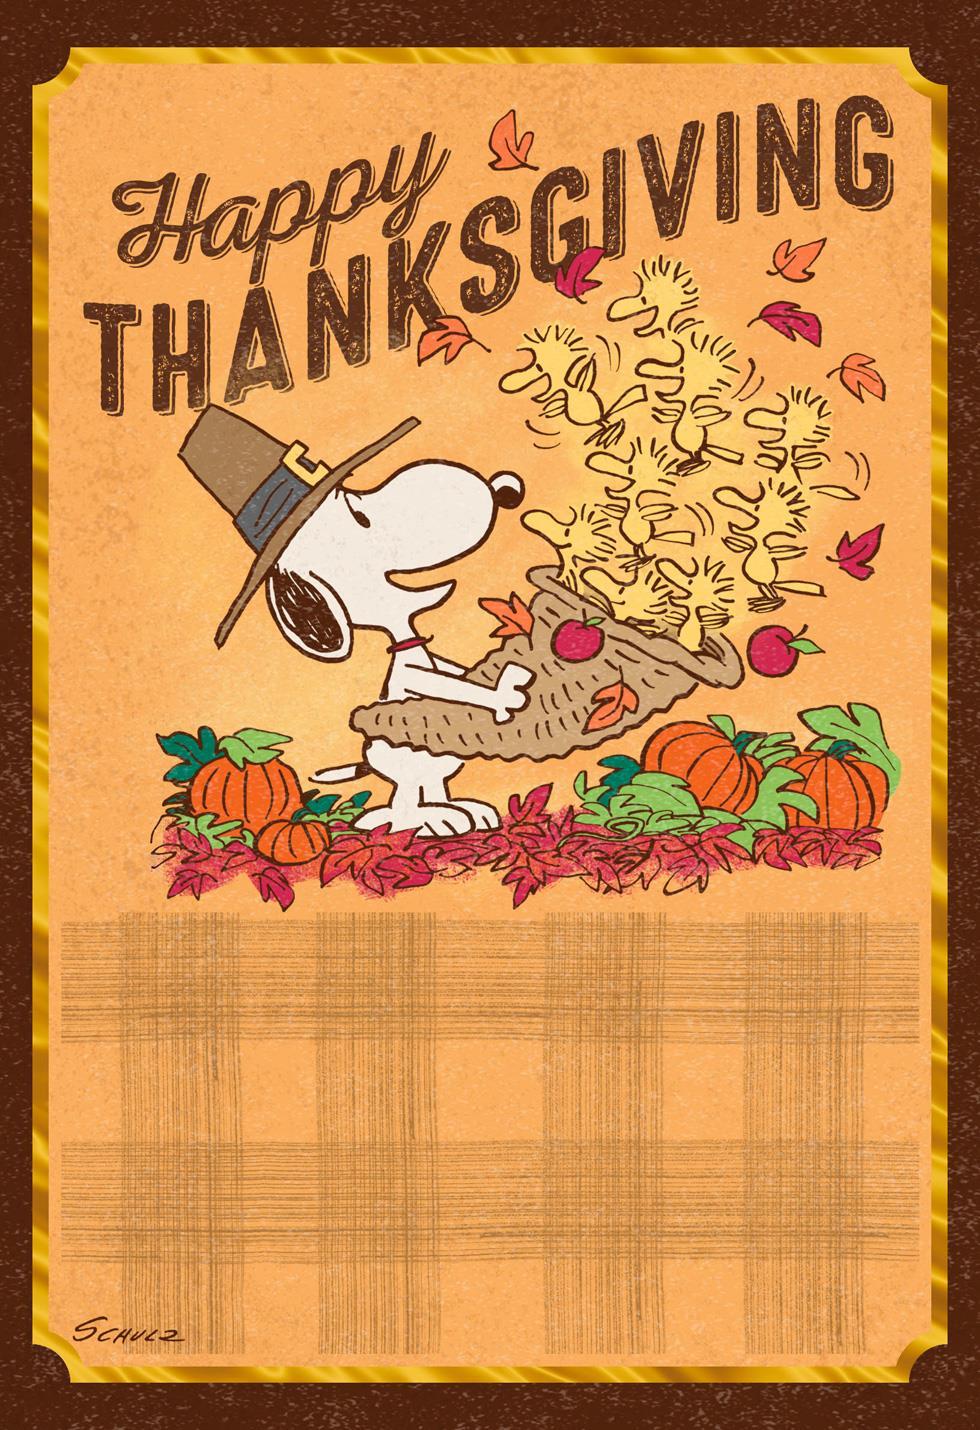 Peanuts 174 Snoopy And Woodstock Cornucopia Thanksgiving Card